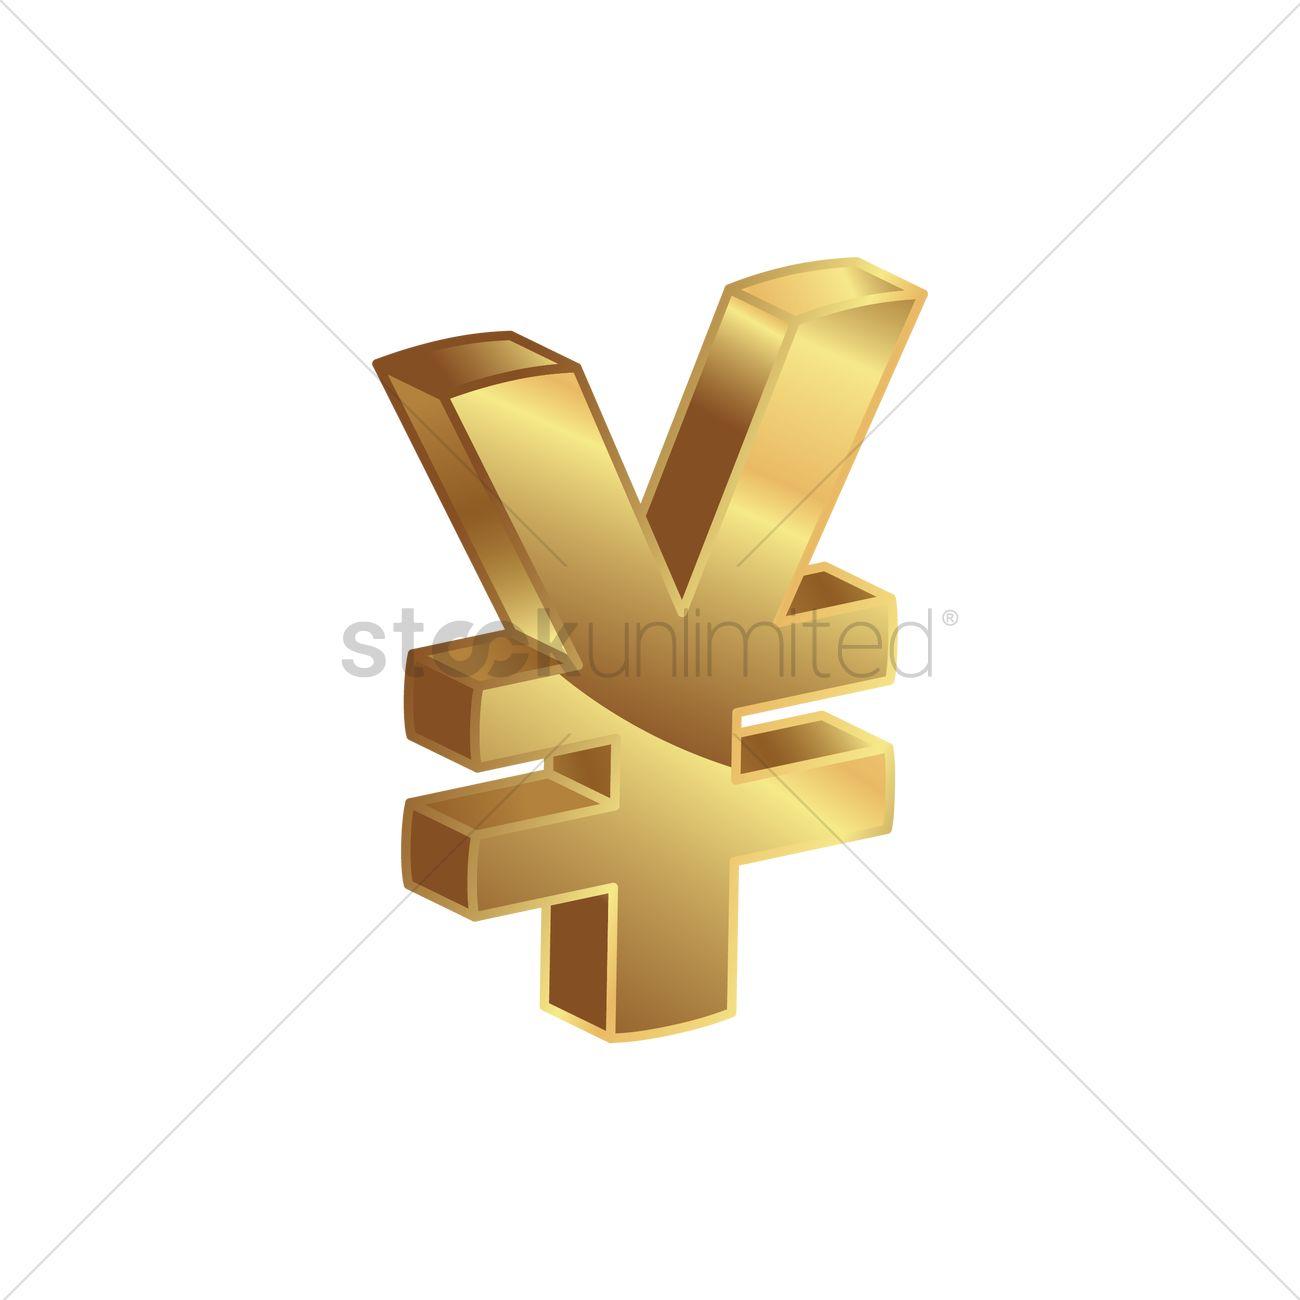 Japanese yen symbol vector image 1871070 stockunlimited japanese yen symbol vector graphic biocorpaavc Choice Image